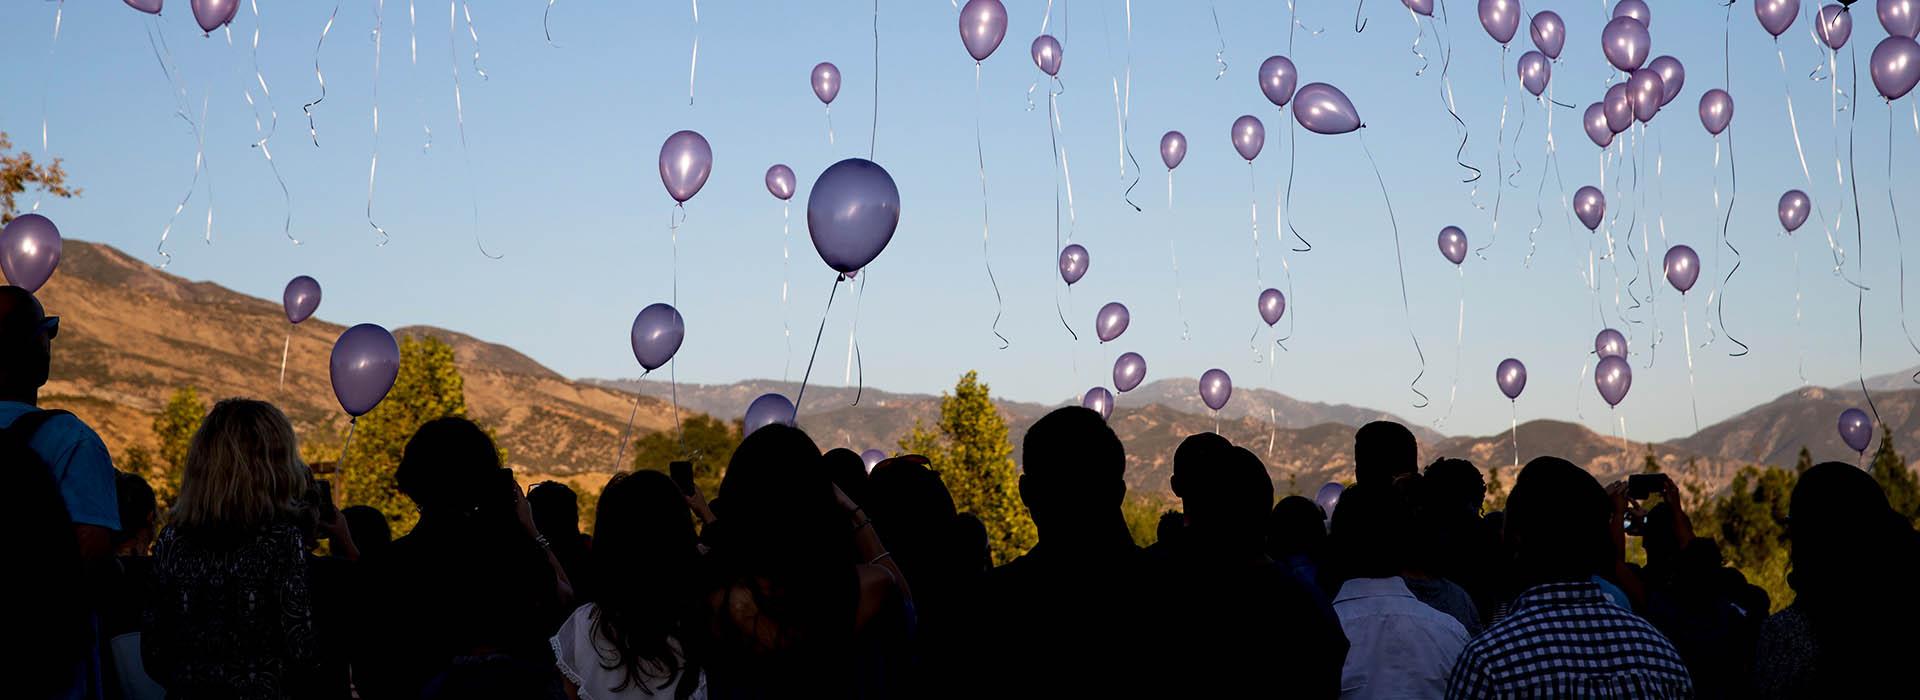 CSUSB vigil celebrates life of student slain in Las Vegas shooting